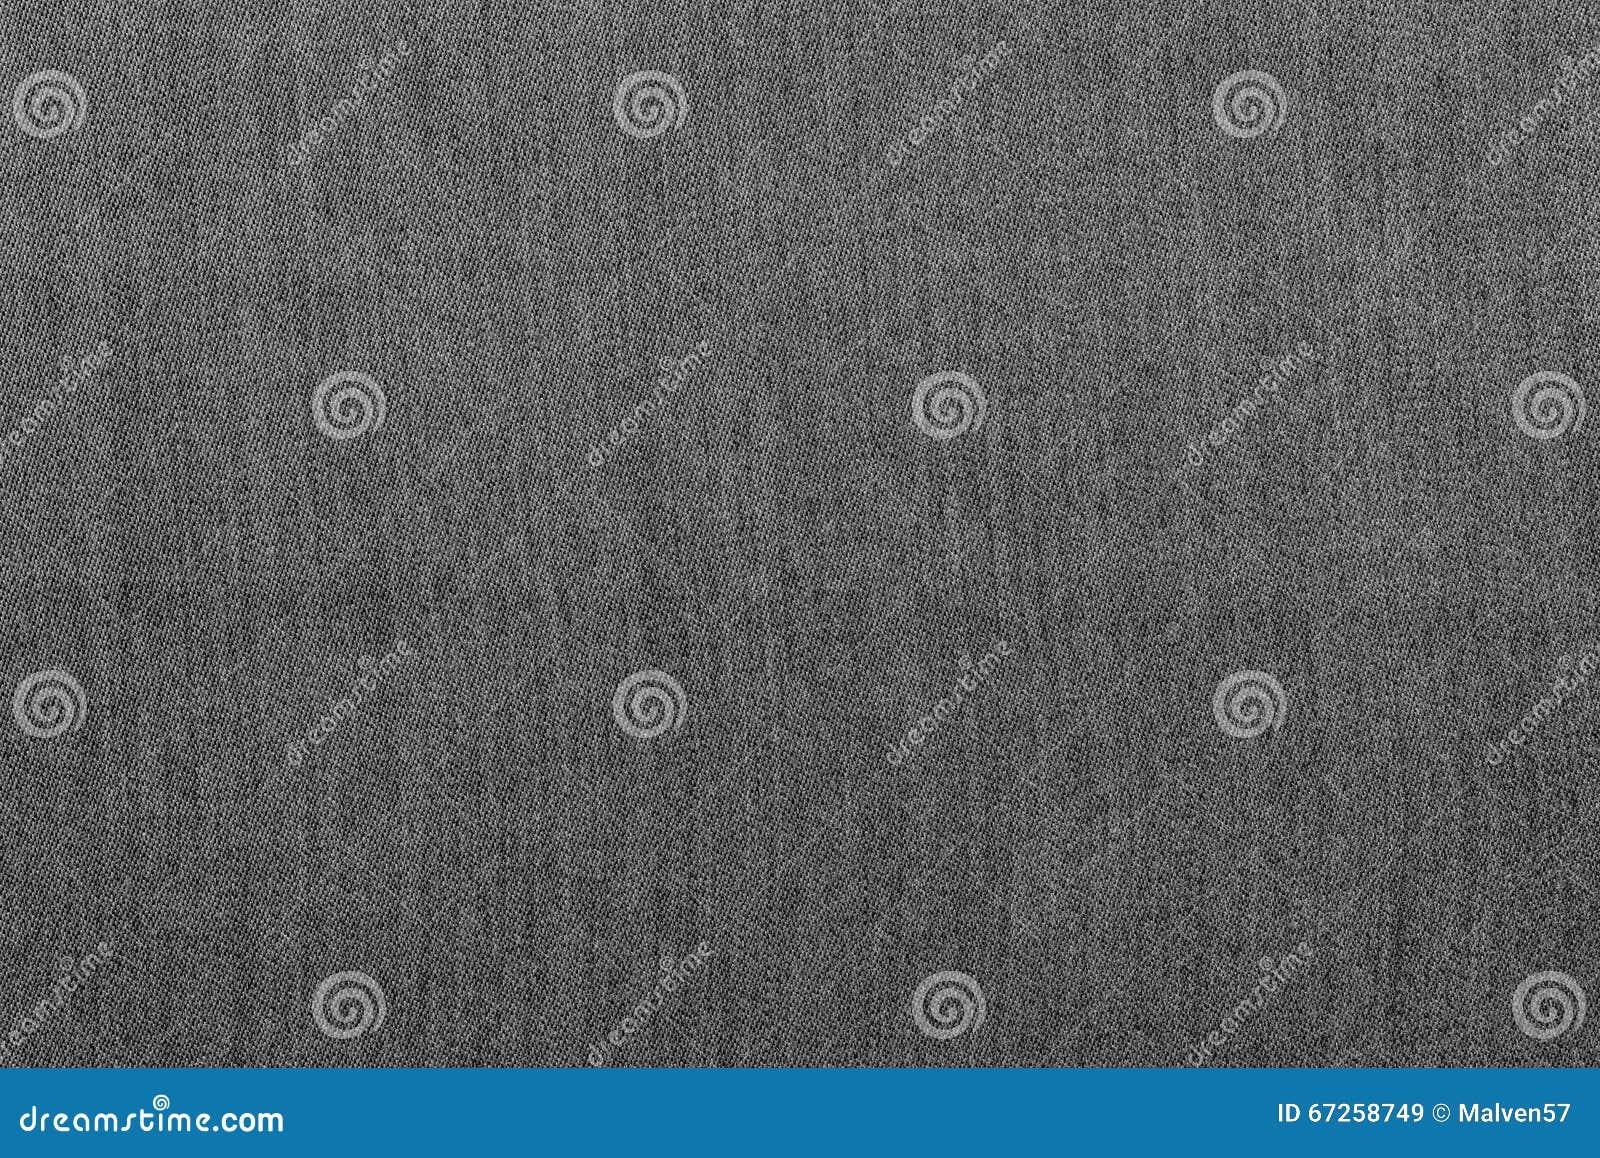 Rough Texture Denim Fabric Monochrome Background Of Gray Color Stock